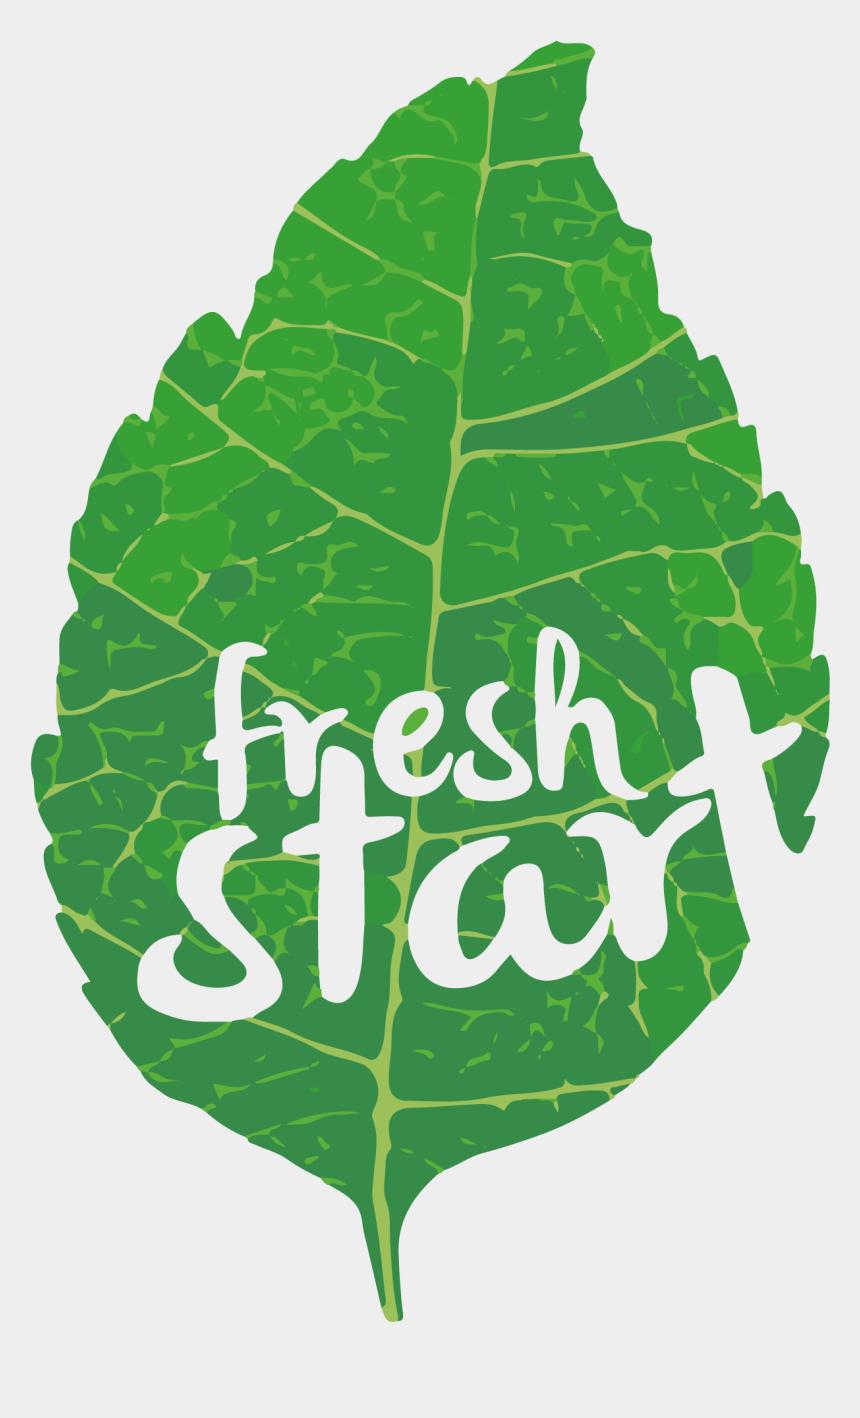 lettuce clipart, Cartoons - Fresh Start New Church Tricities Wa Ⓒ - Collard Greens